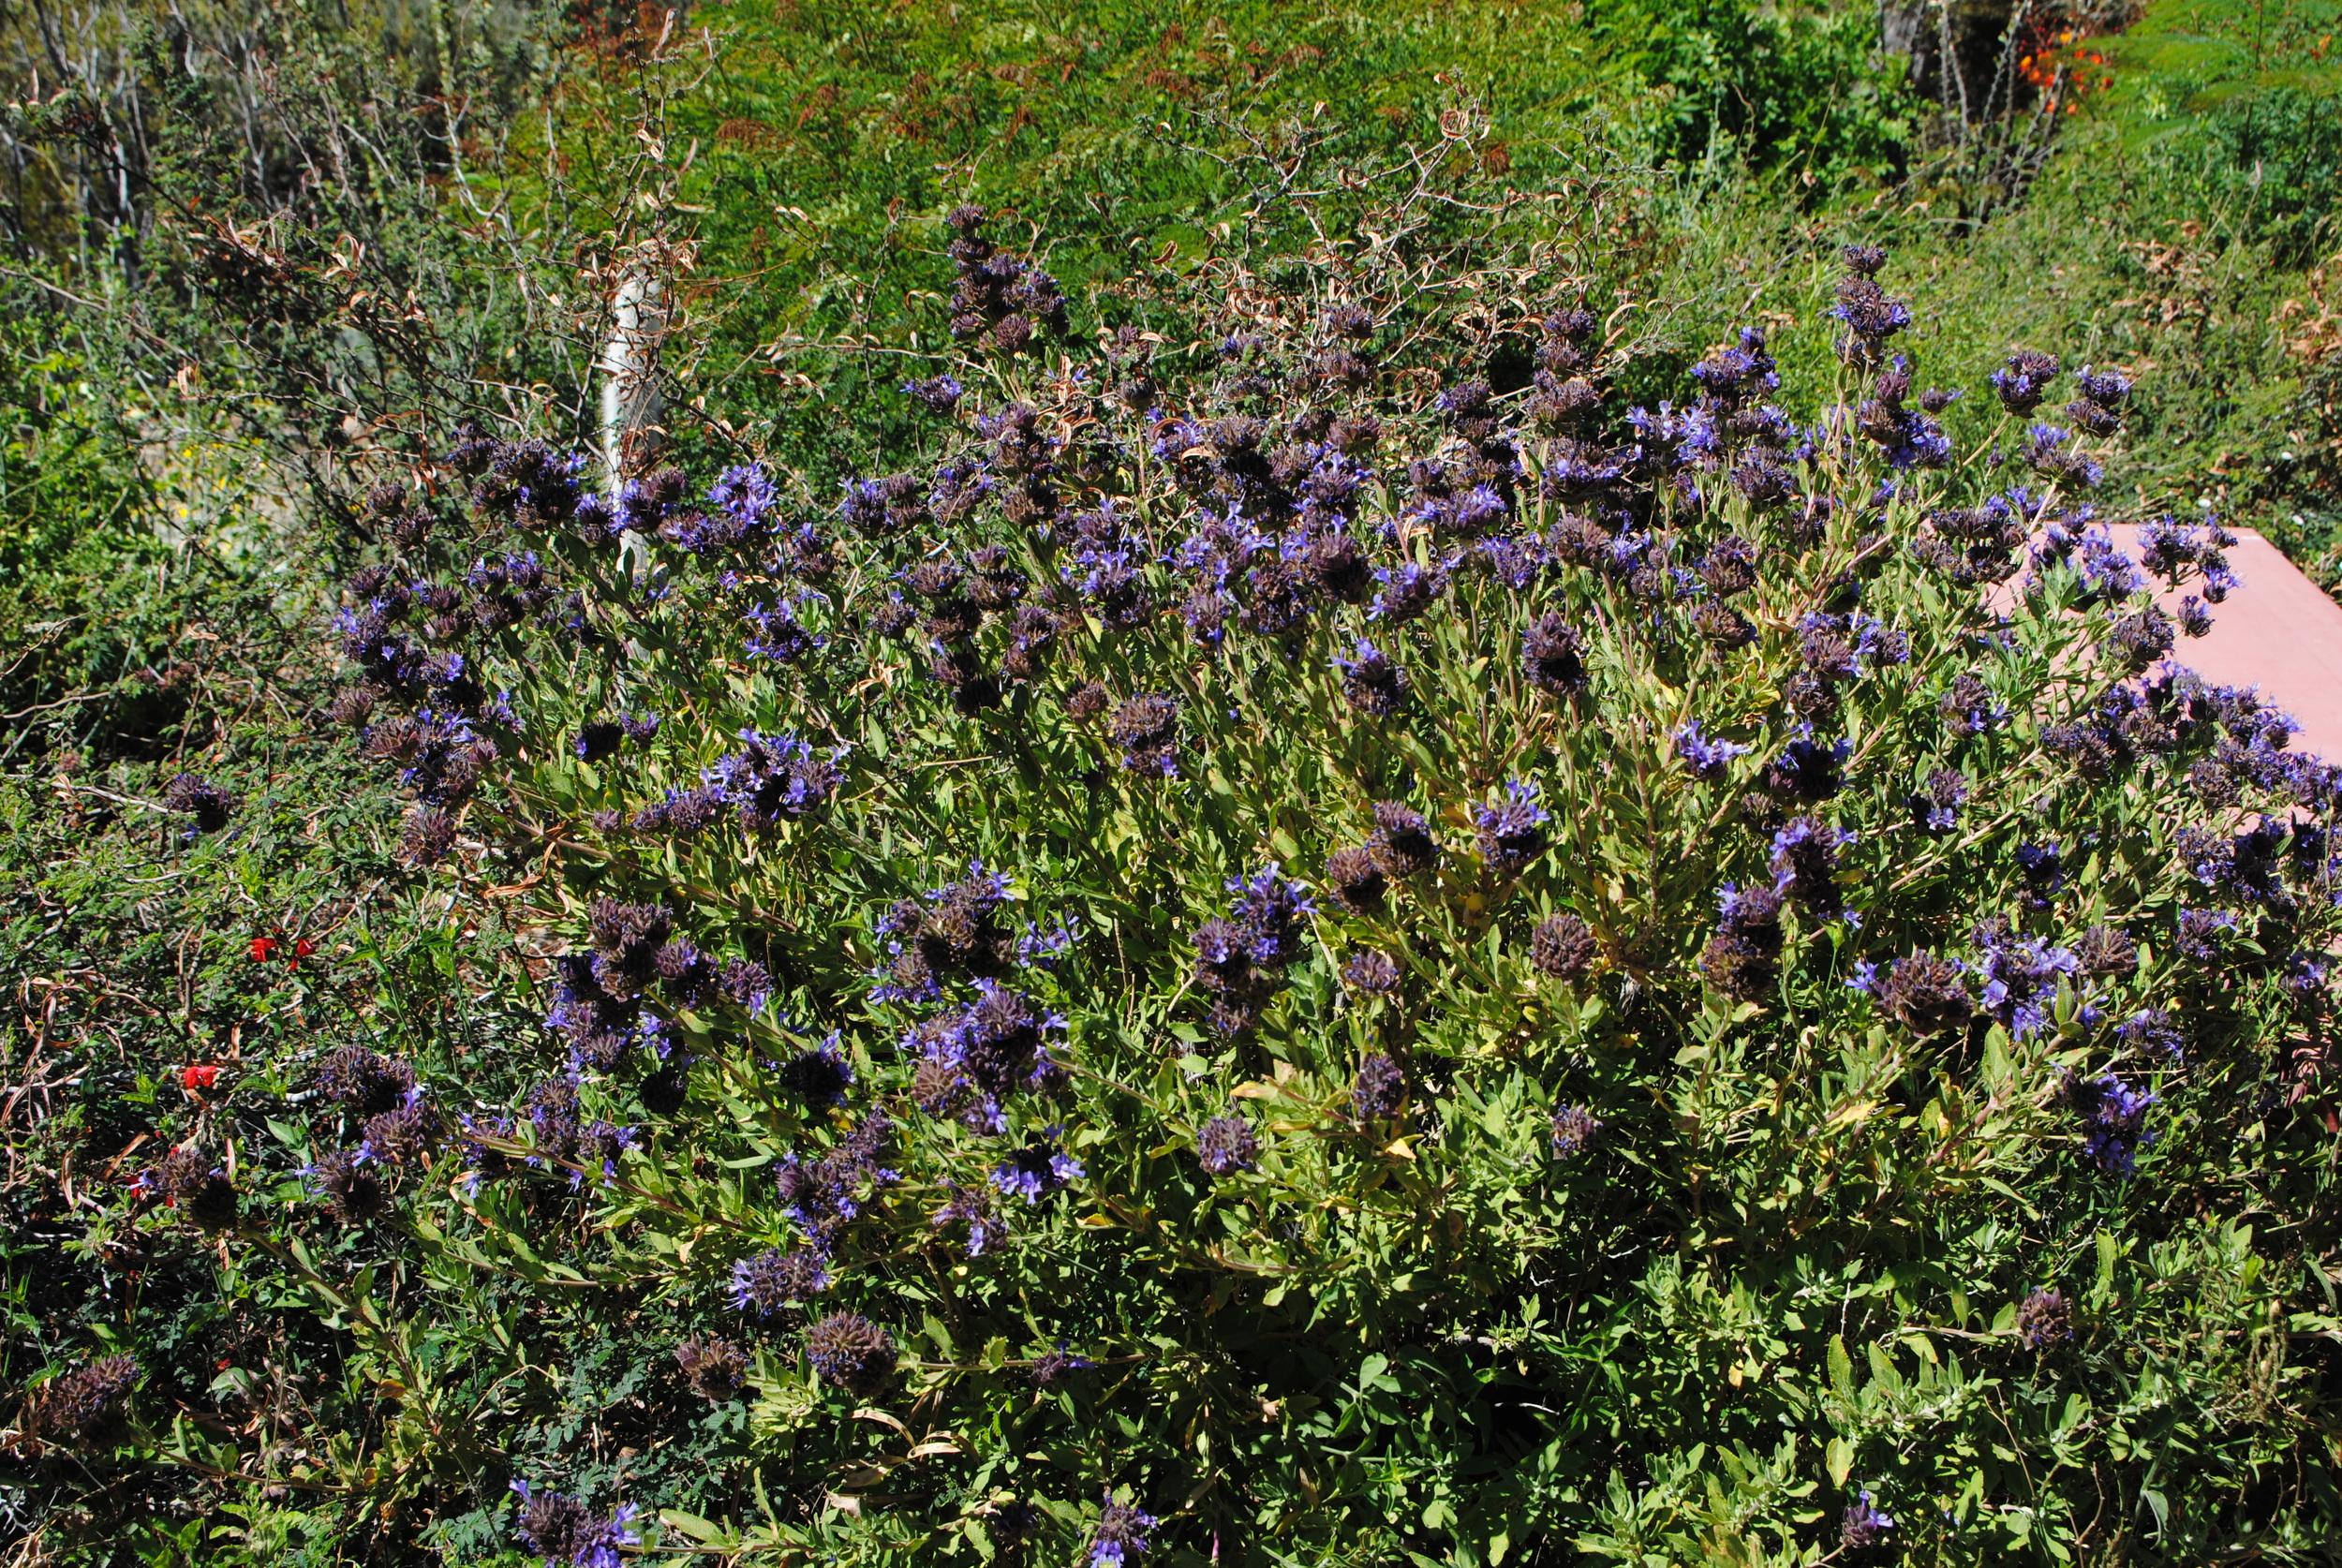 Salvia mohavensis xclevelandii in the Pollinator Garden